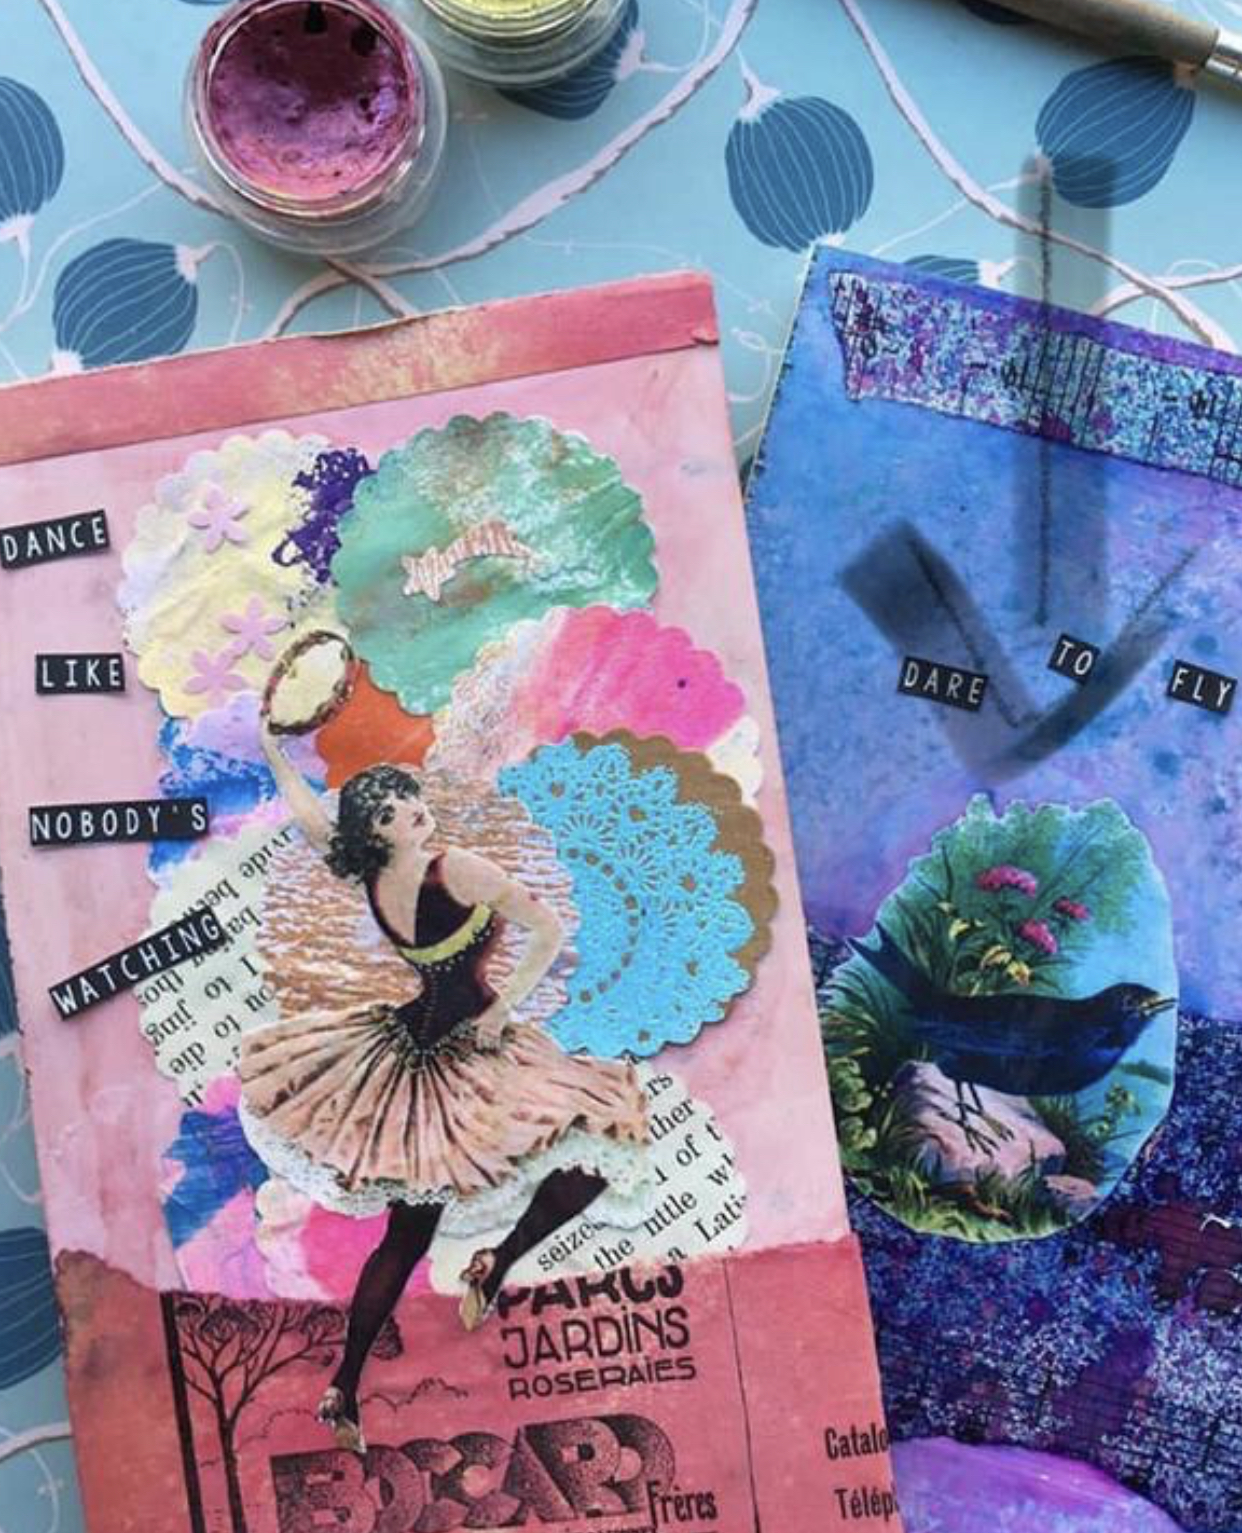 Heathers Intuitive Artwork.